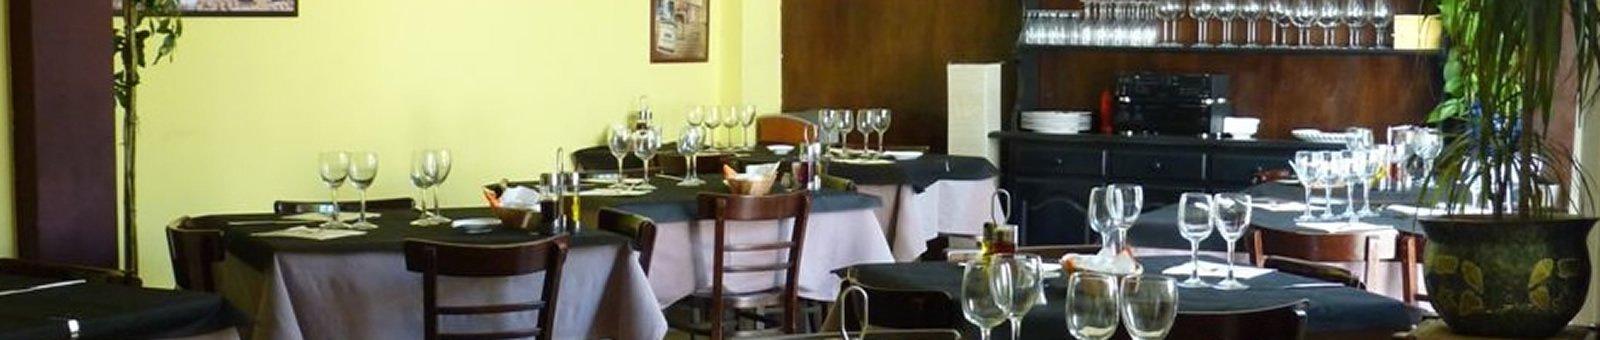 restaurante comida tradicional menorca